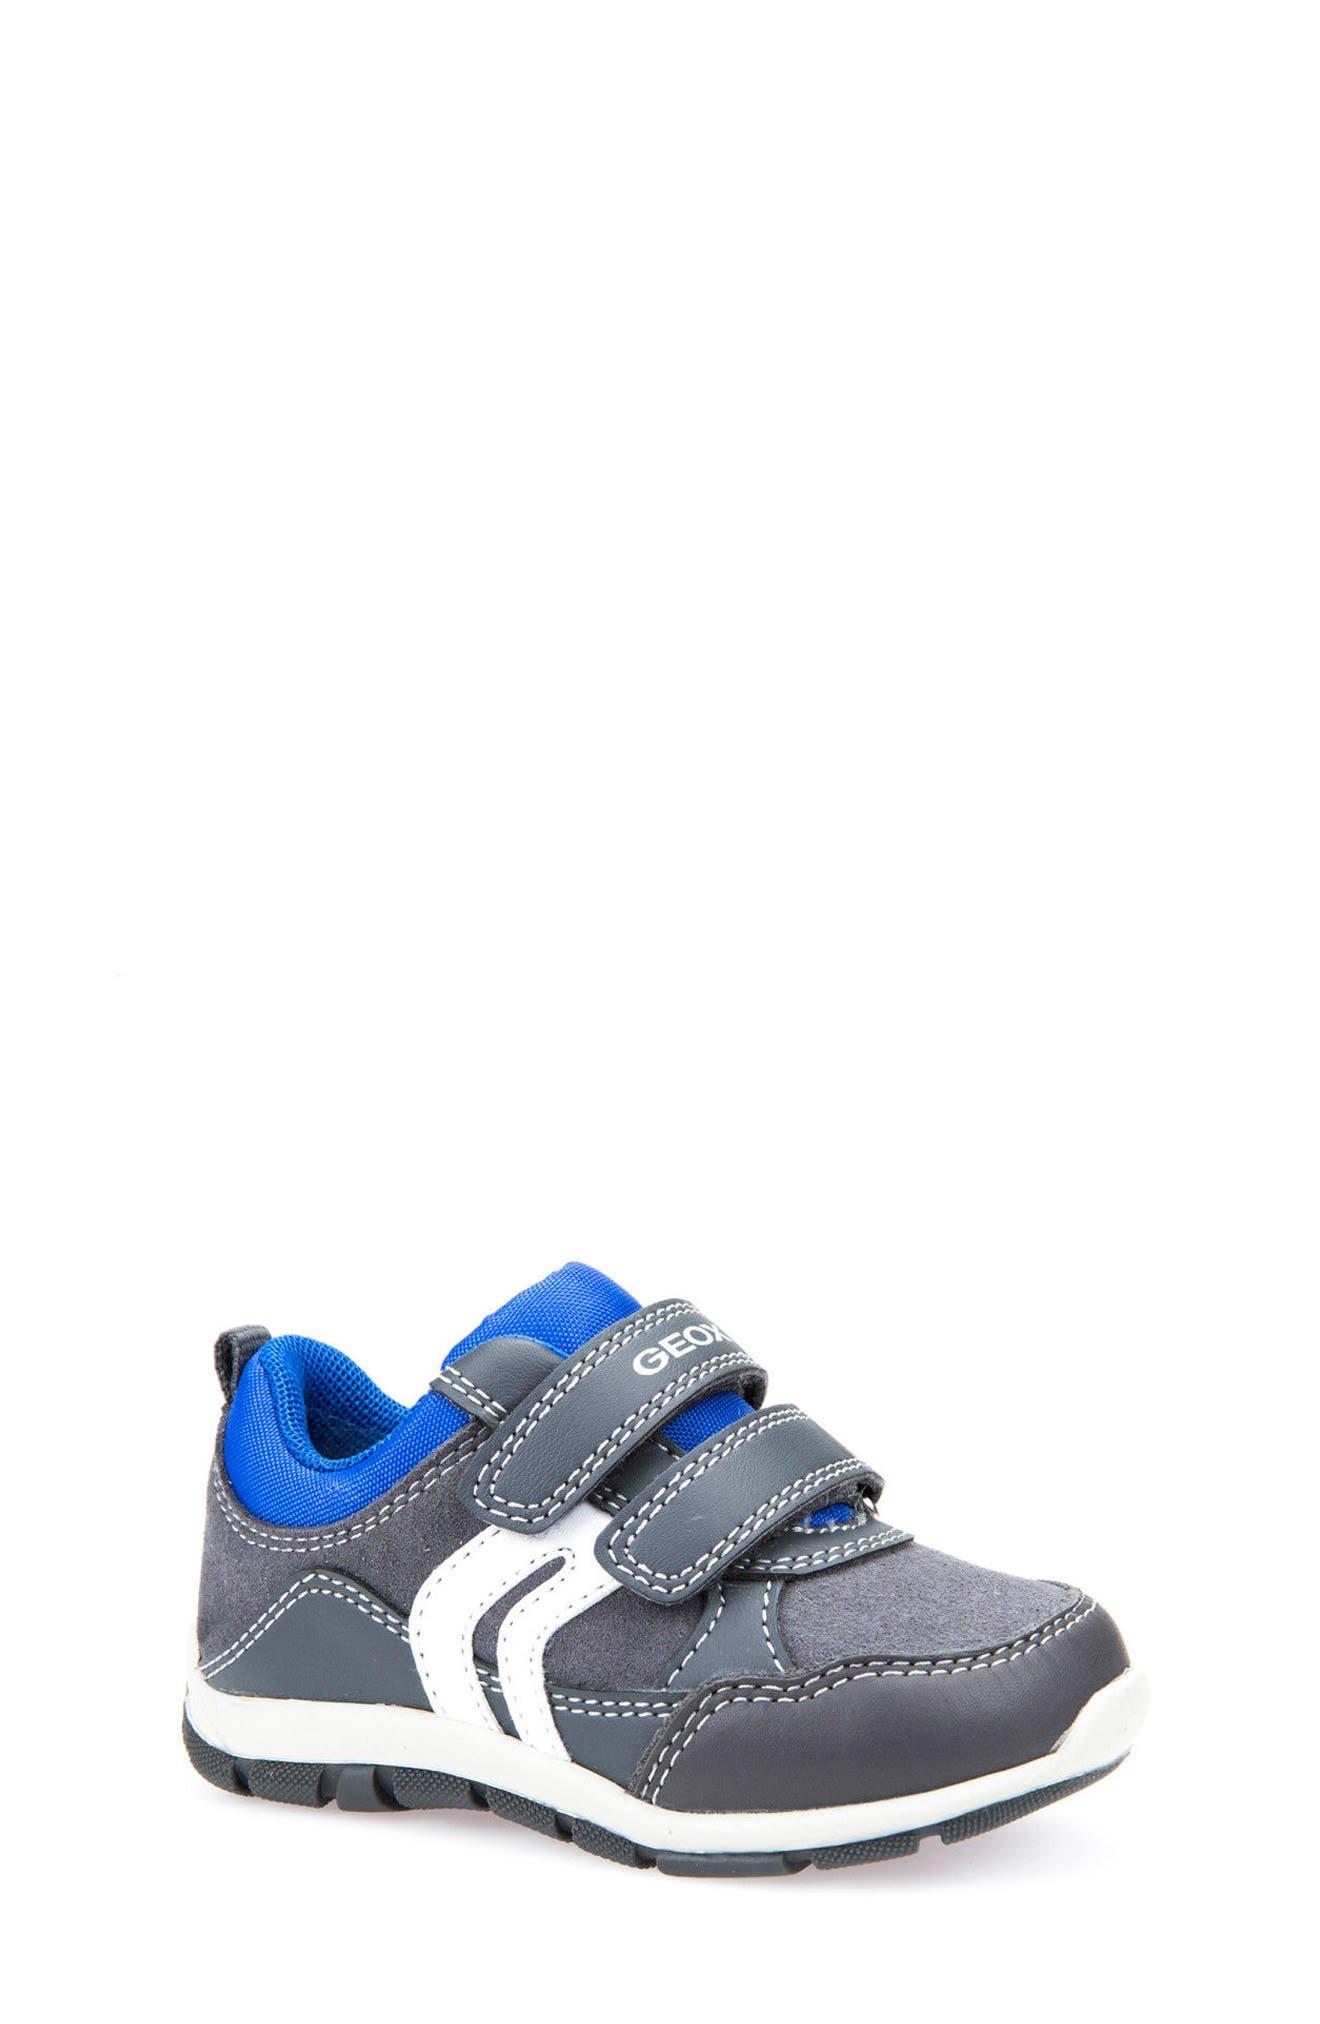 'Shaax 9' Sneaker,                         Main,                         color, Grey/ Royal